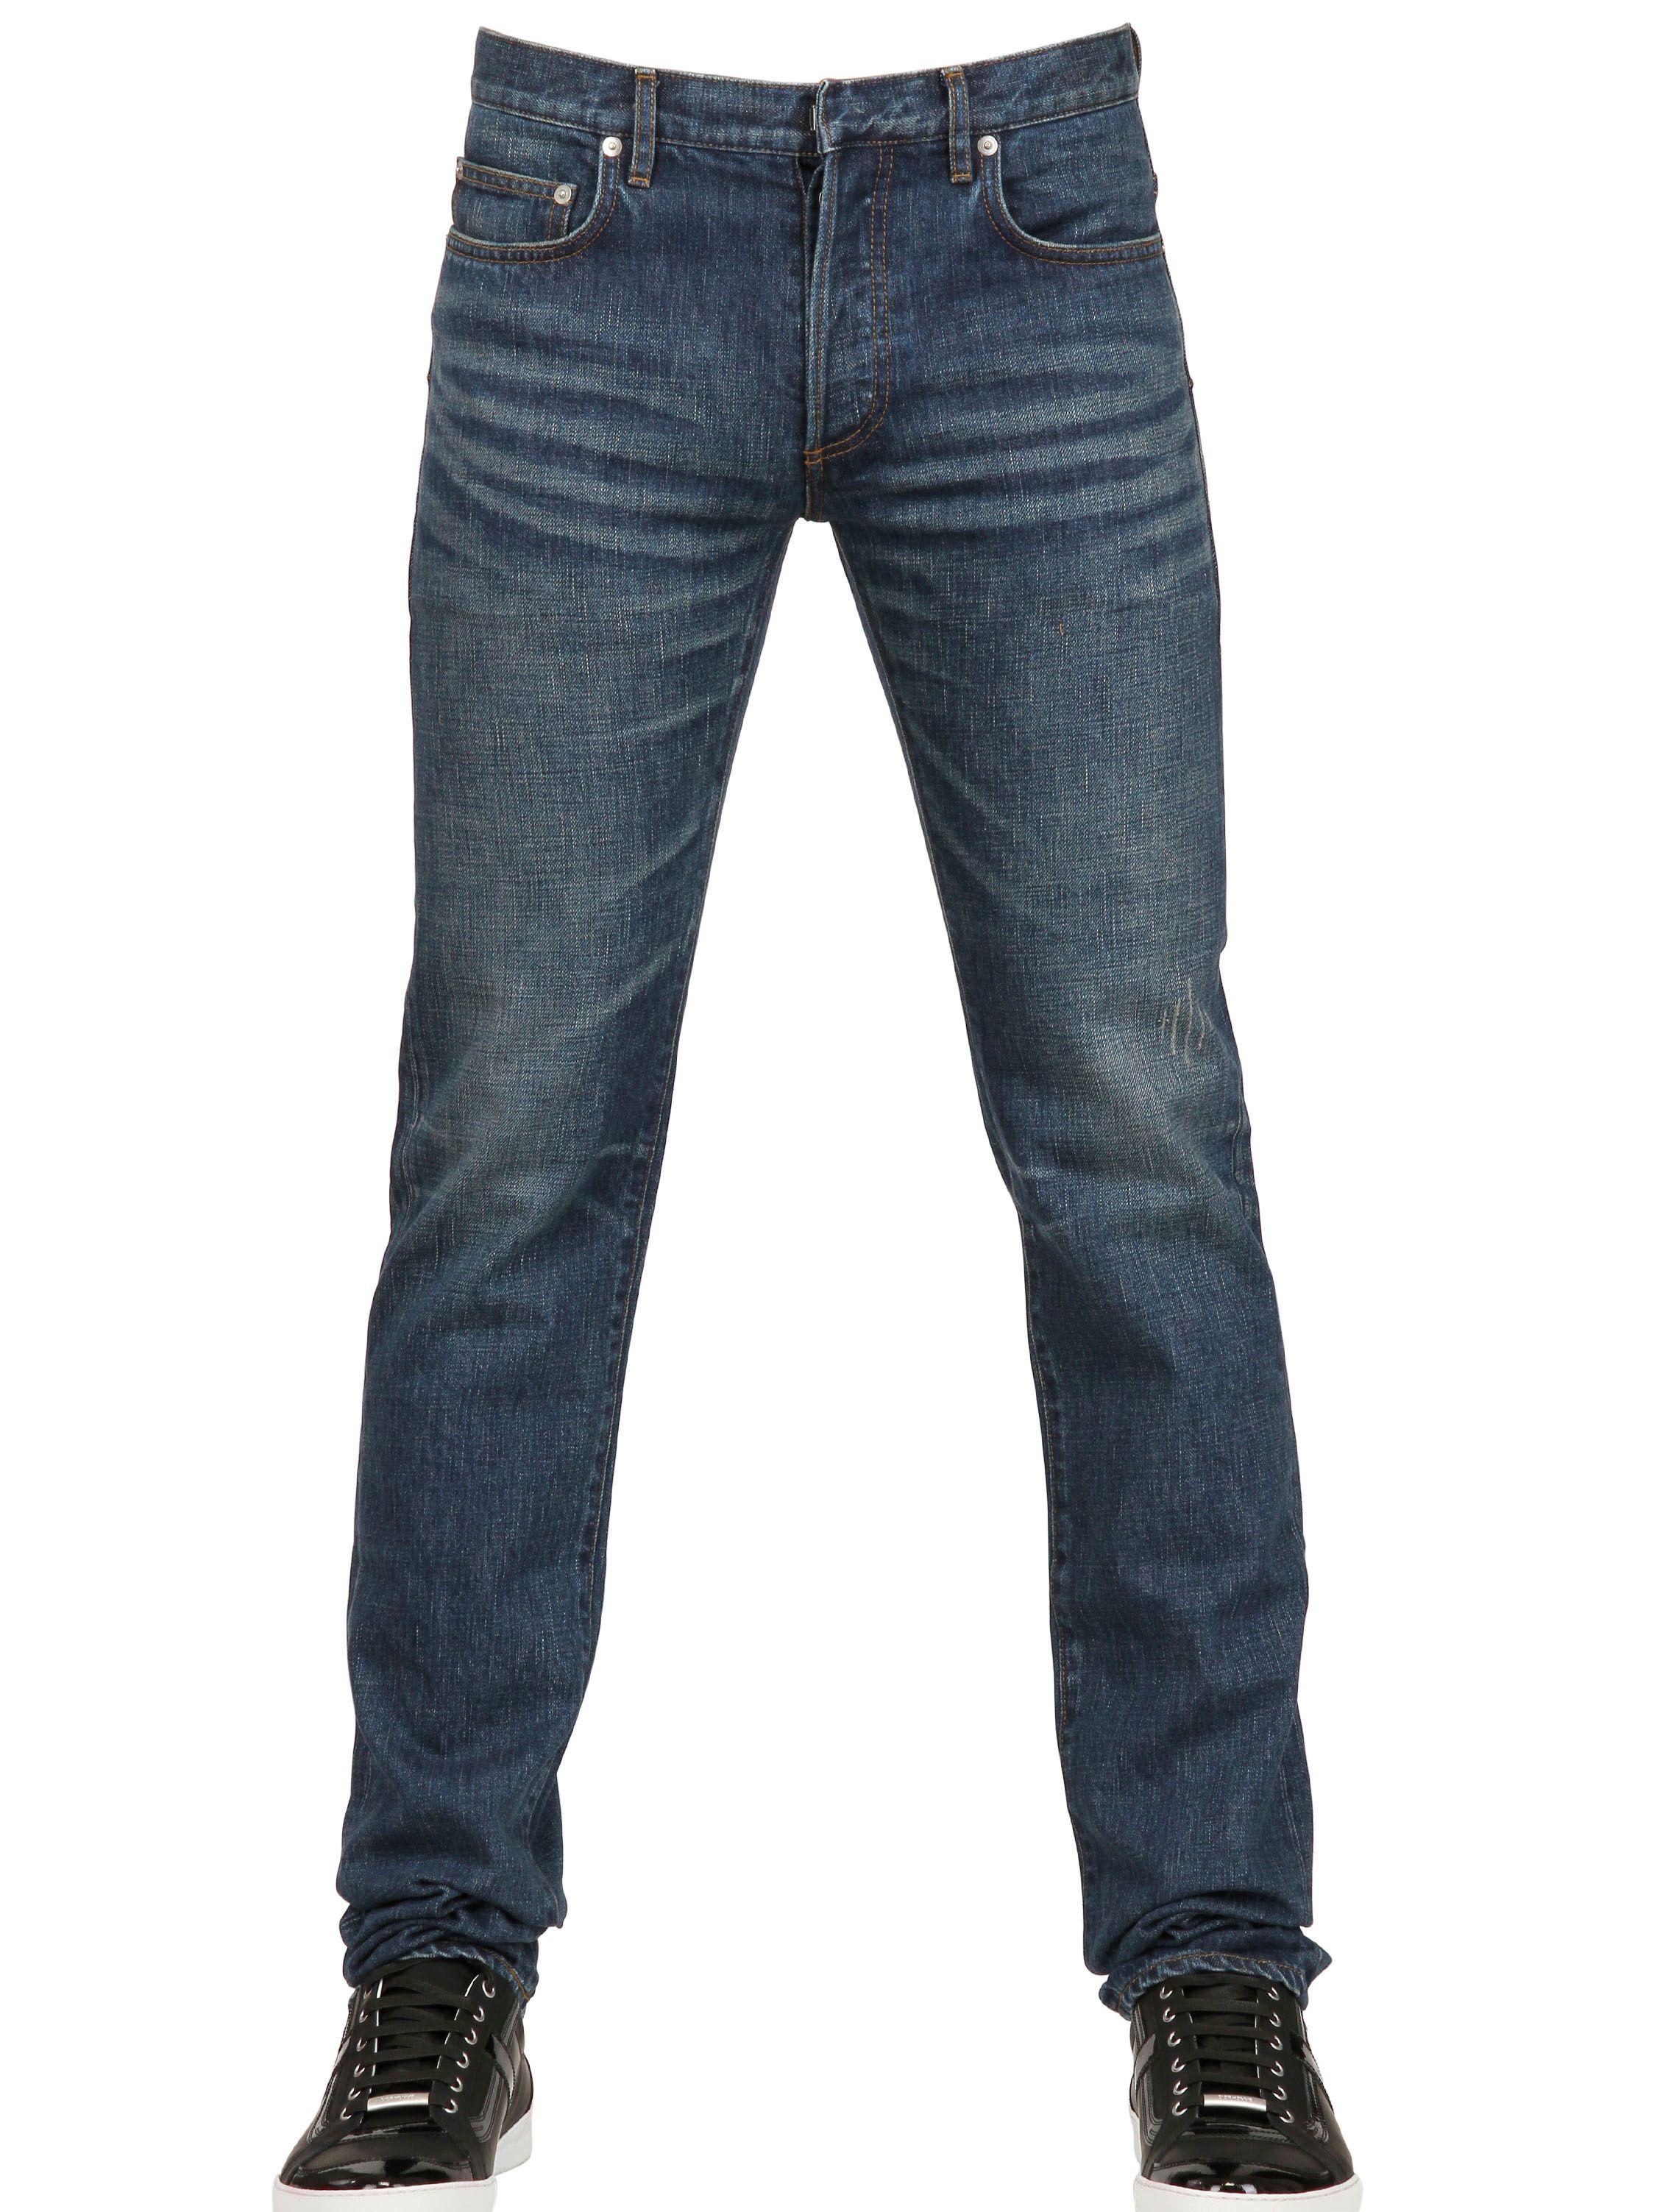 Dior homme denim jeans